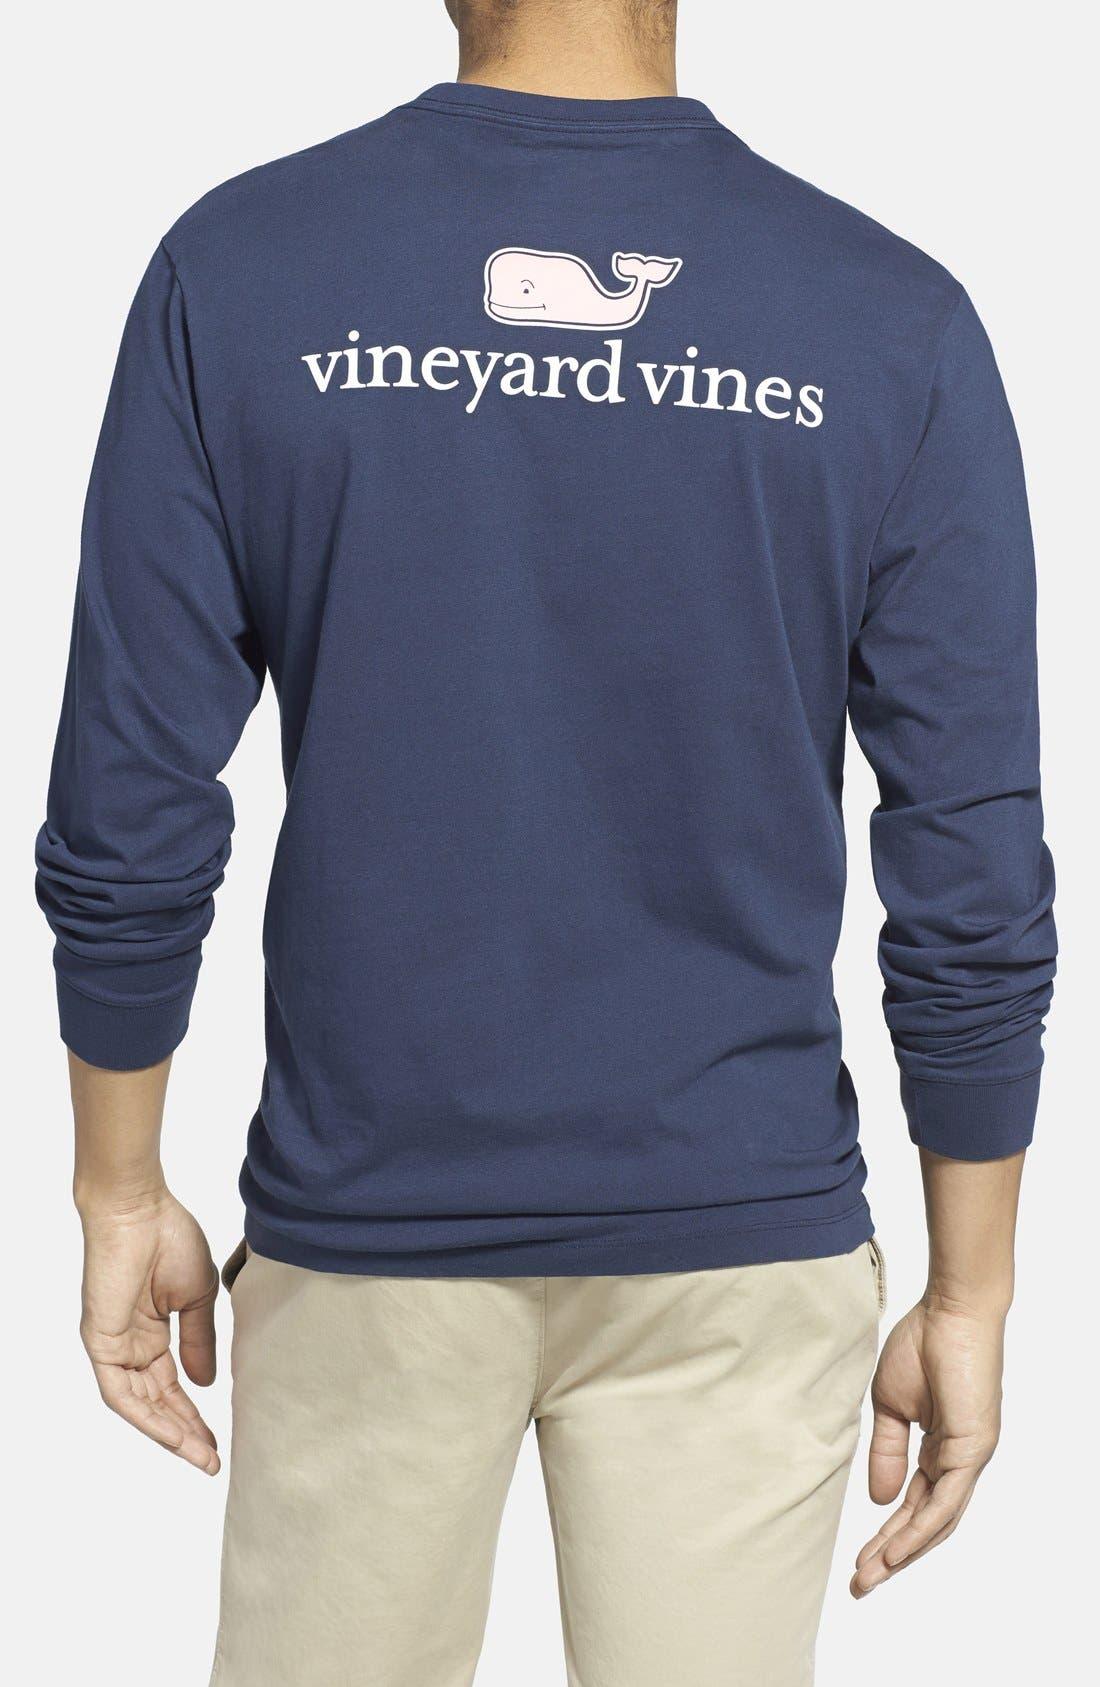 Main Image - vineyard vines Logo Pocket Long Sleeve Crewneck T-Shirt